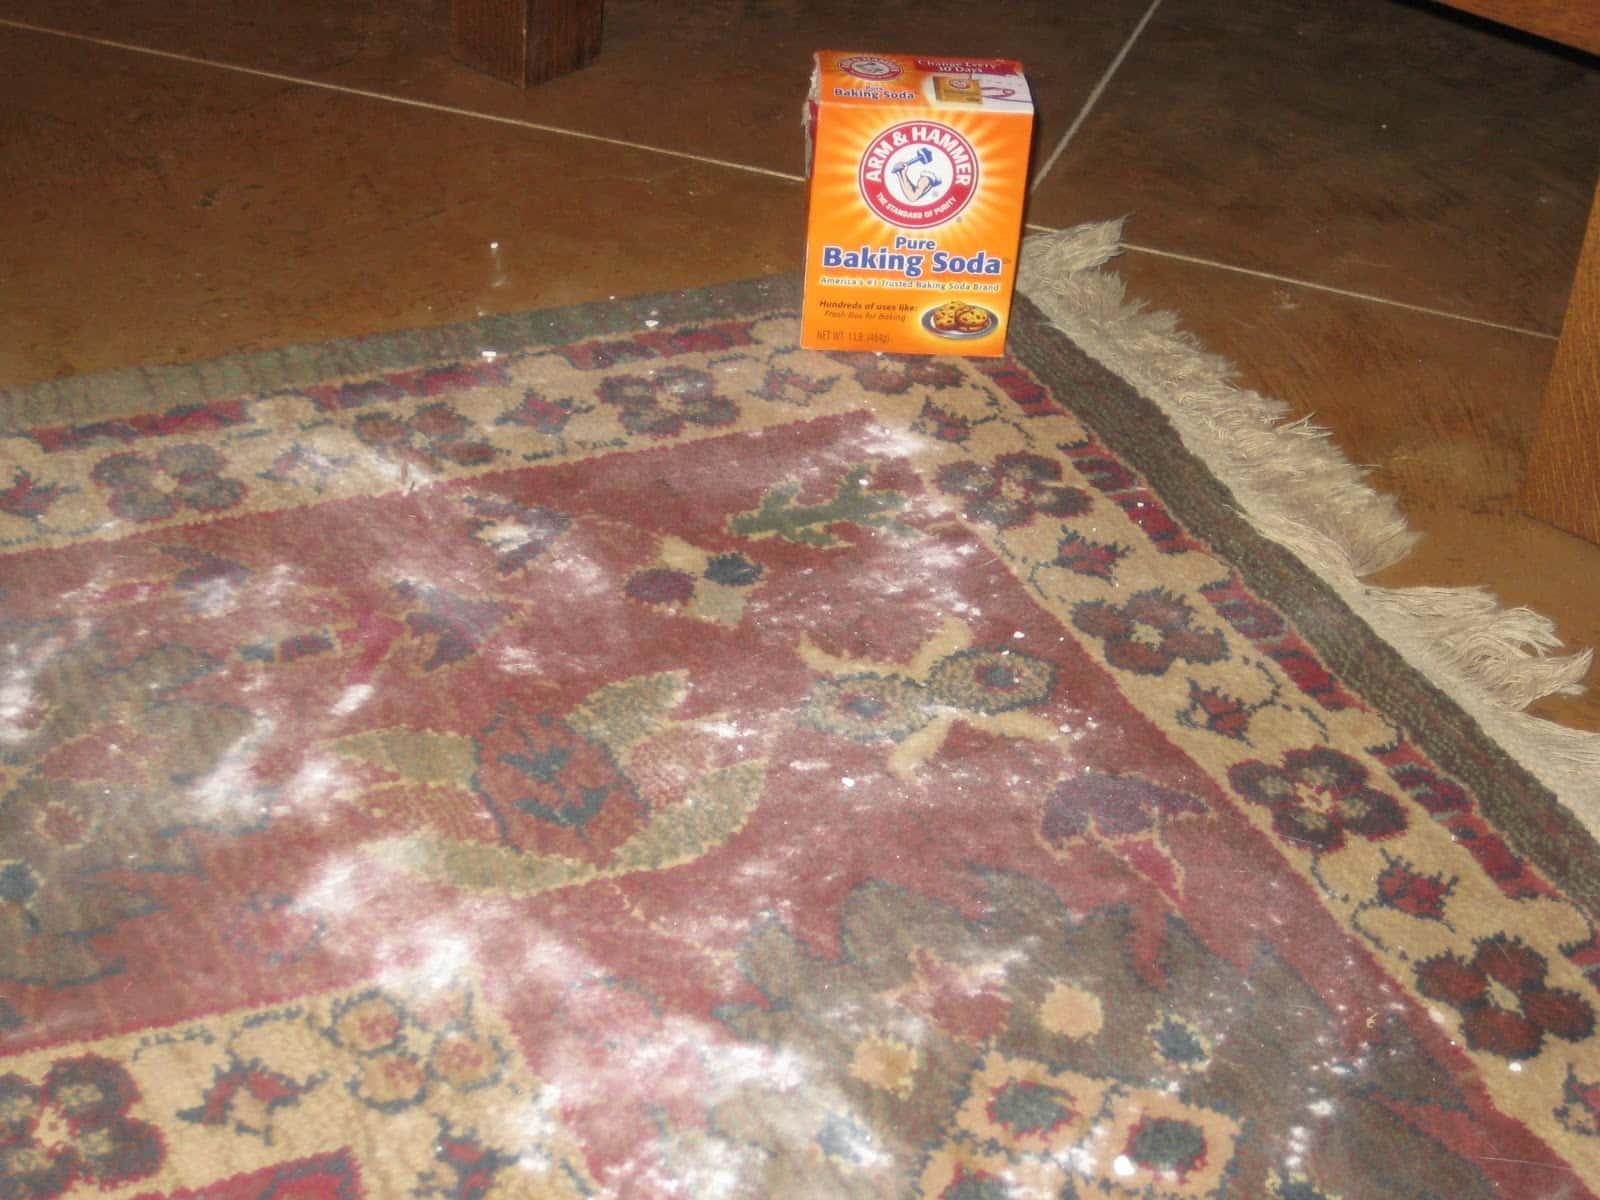 Get vomit off your carpet